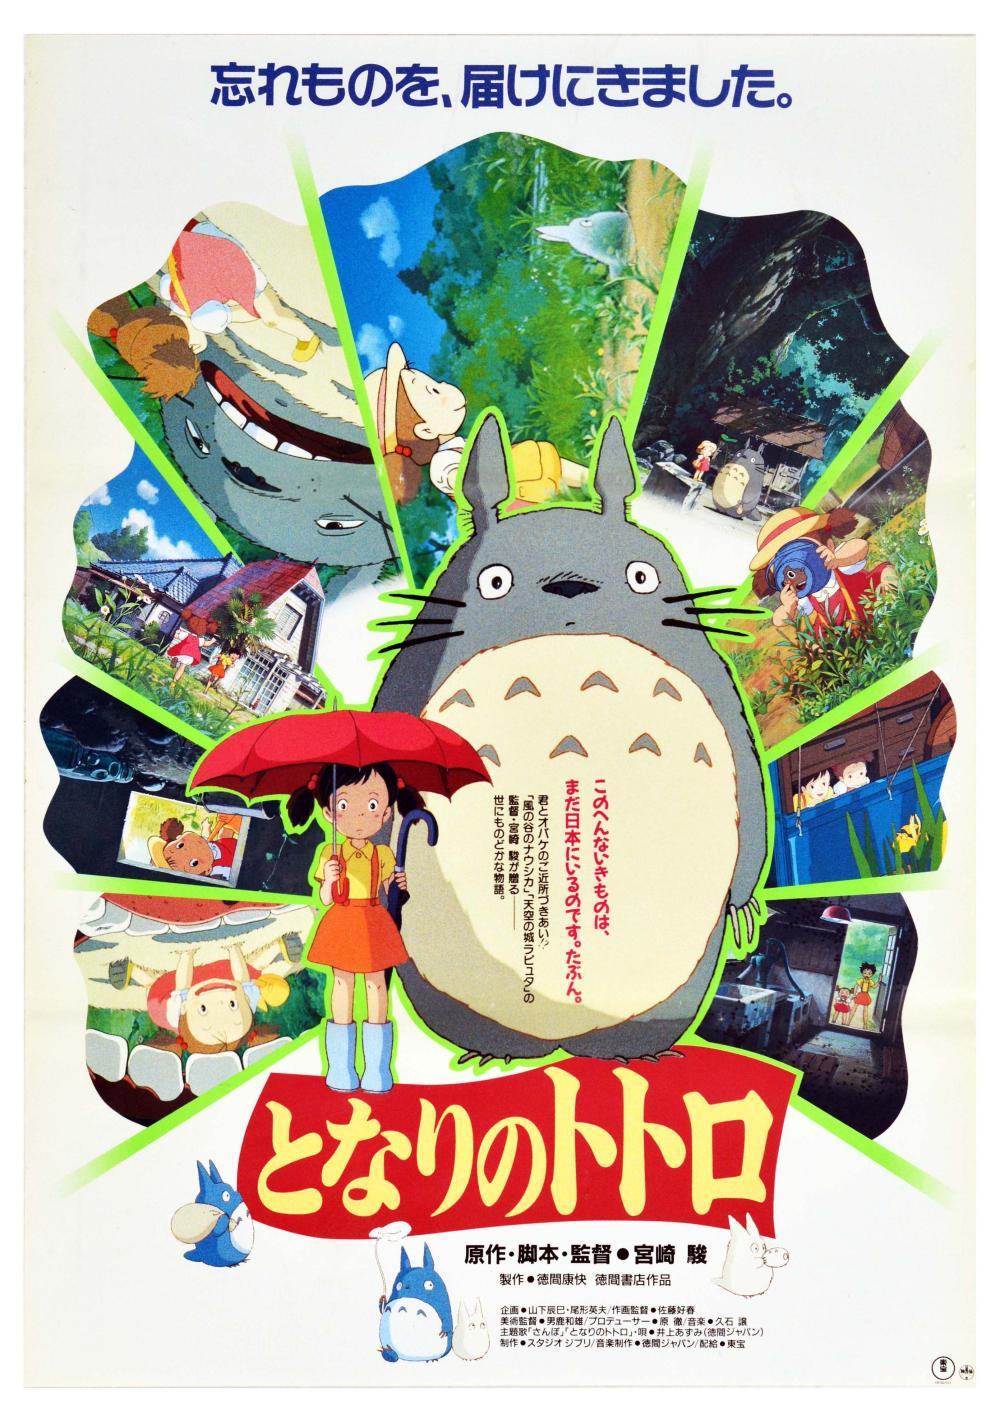 Film Poster My Neighbour Tortoro Japan Anime Studio Ghibli